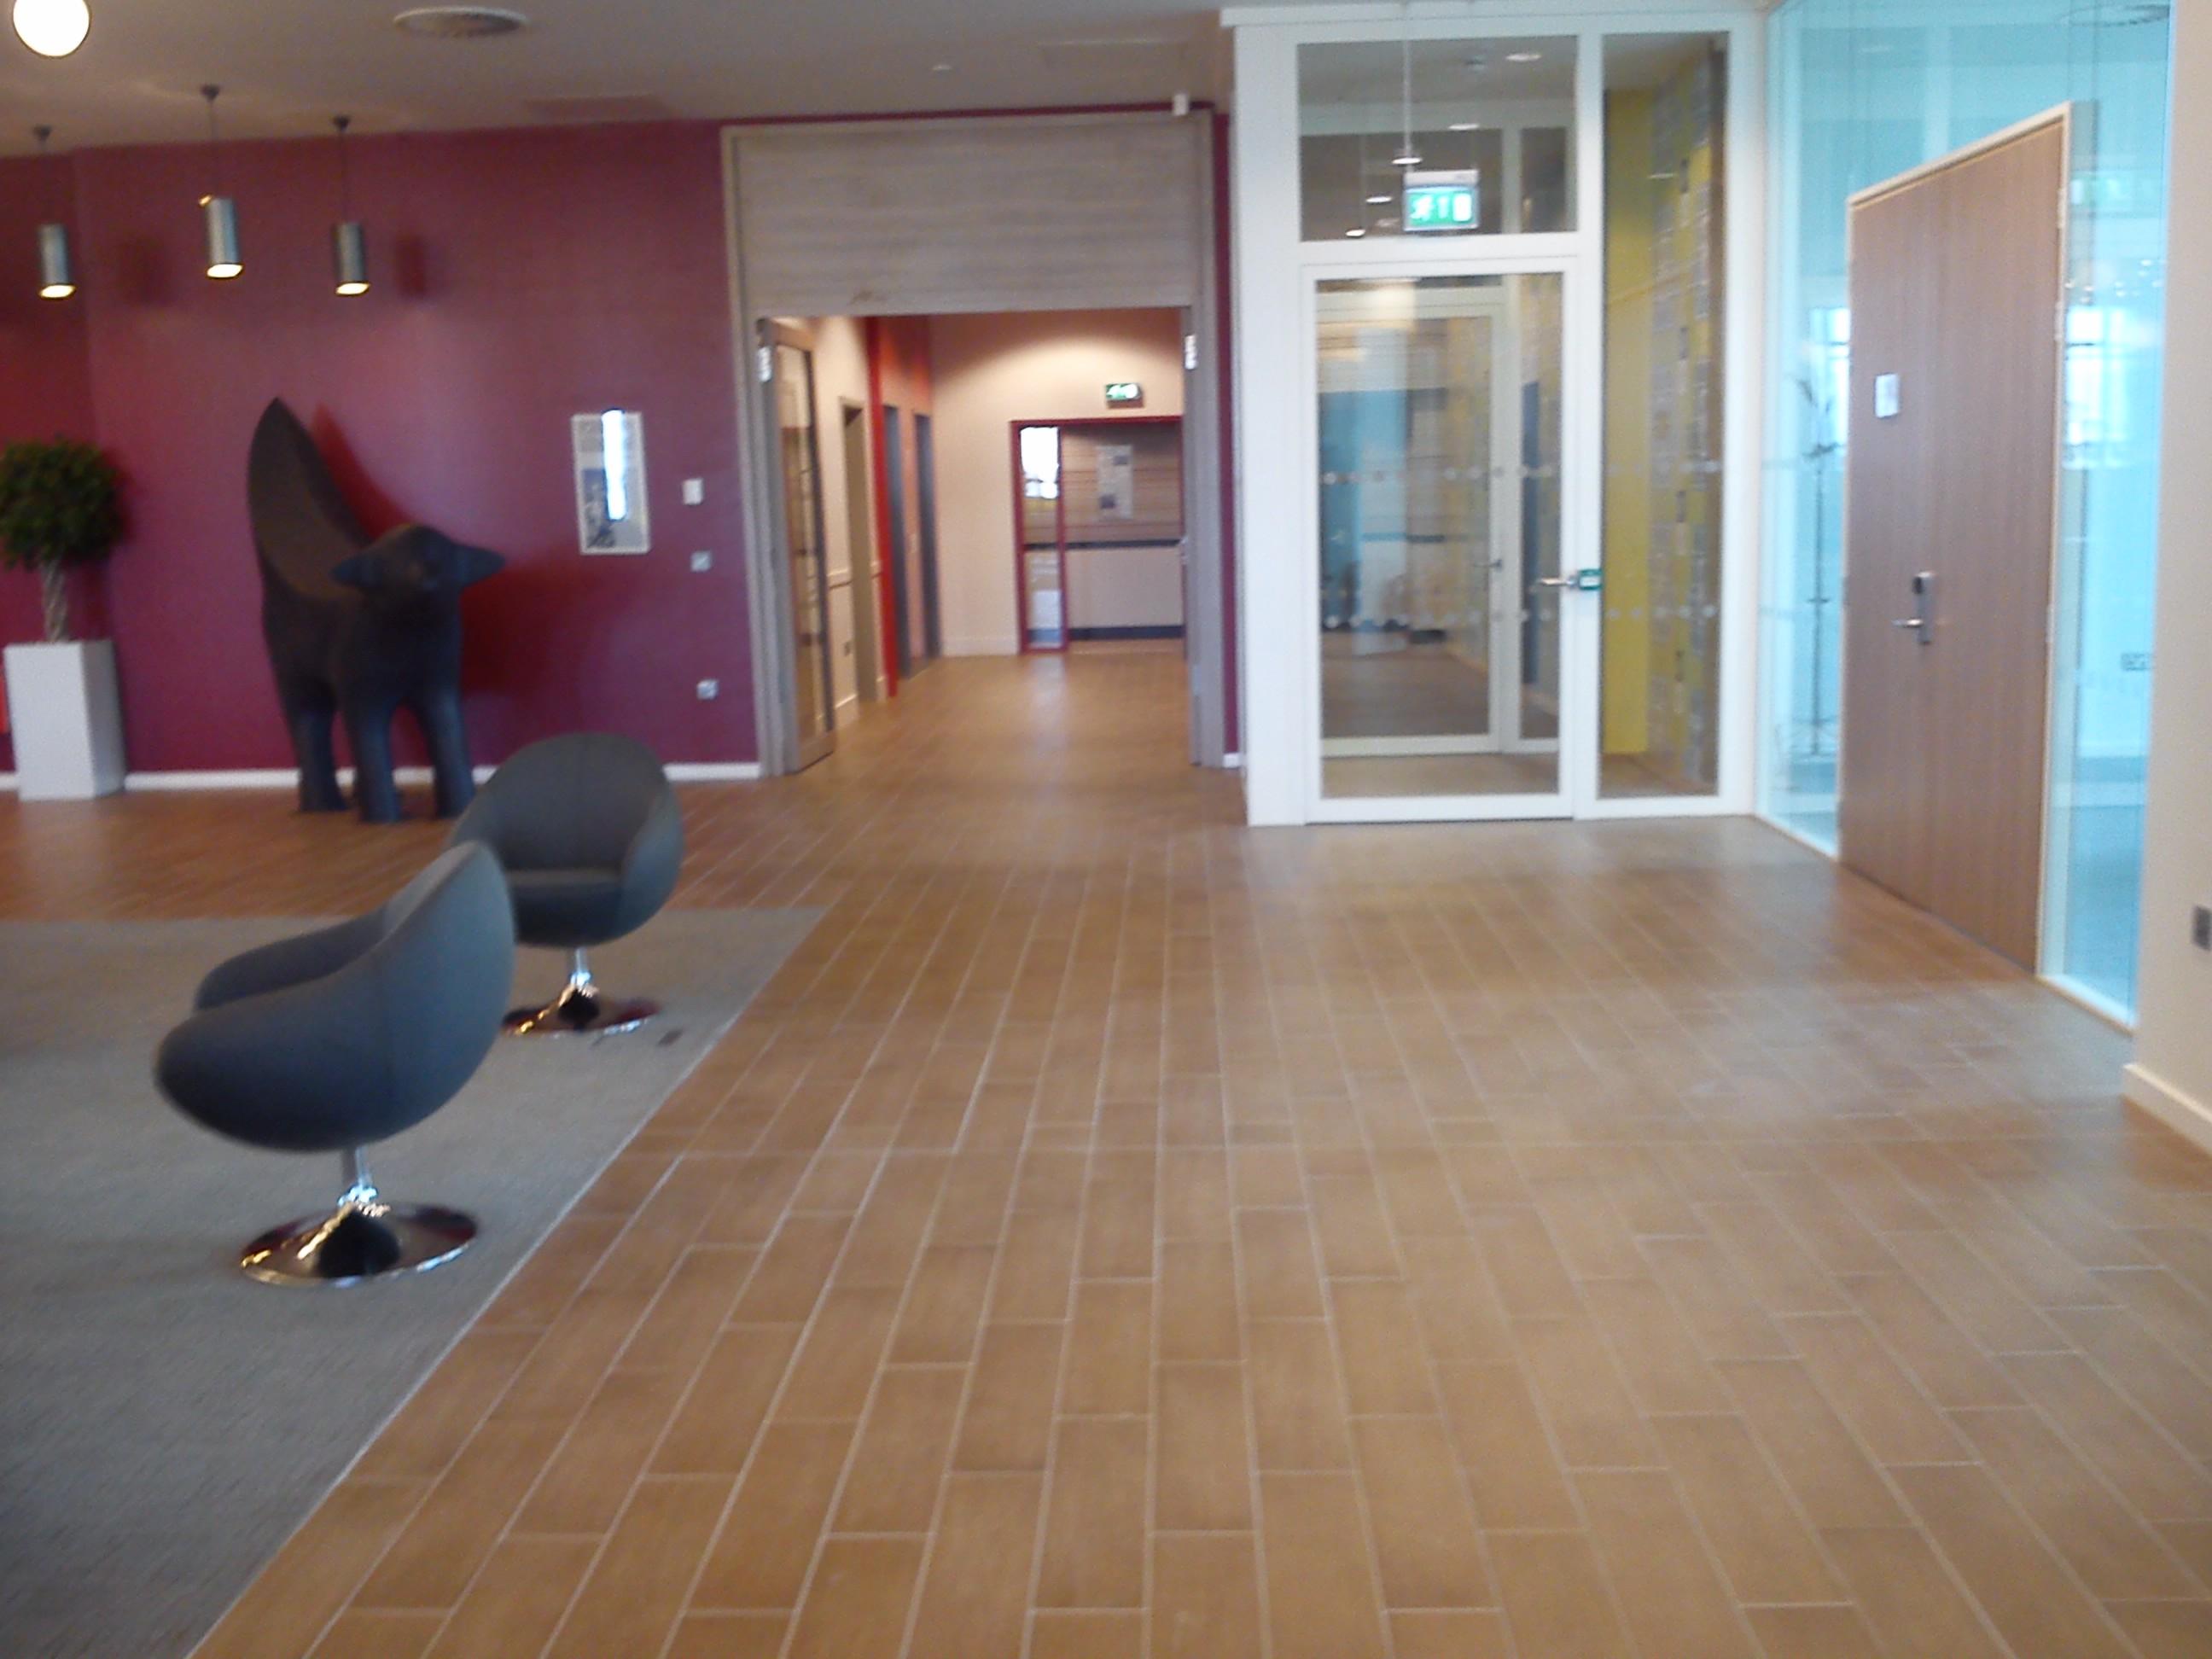 Hotel Entrance Foyer : Abd ceramics limited entrance tiling foyer plank tiles laminate